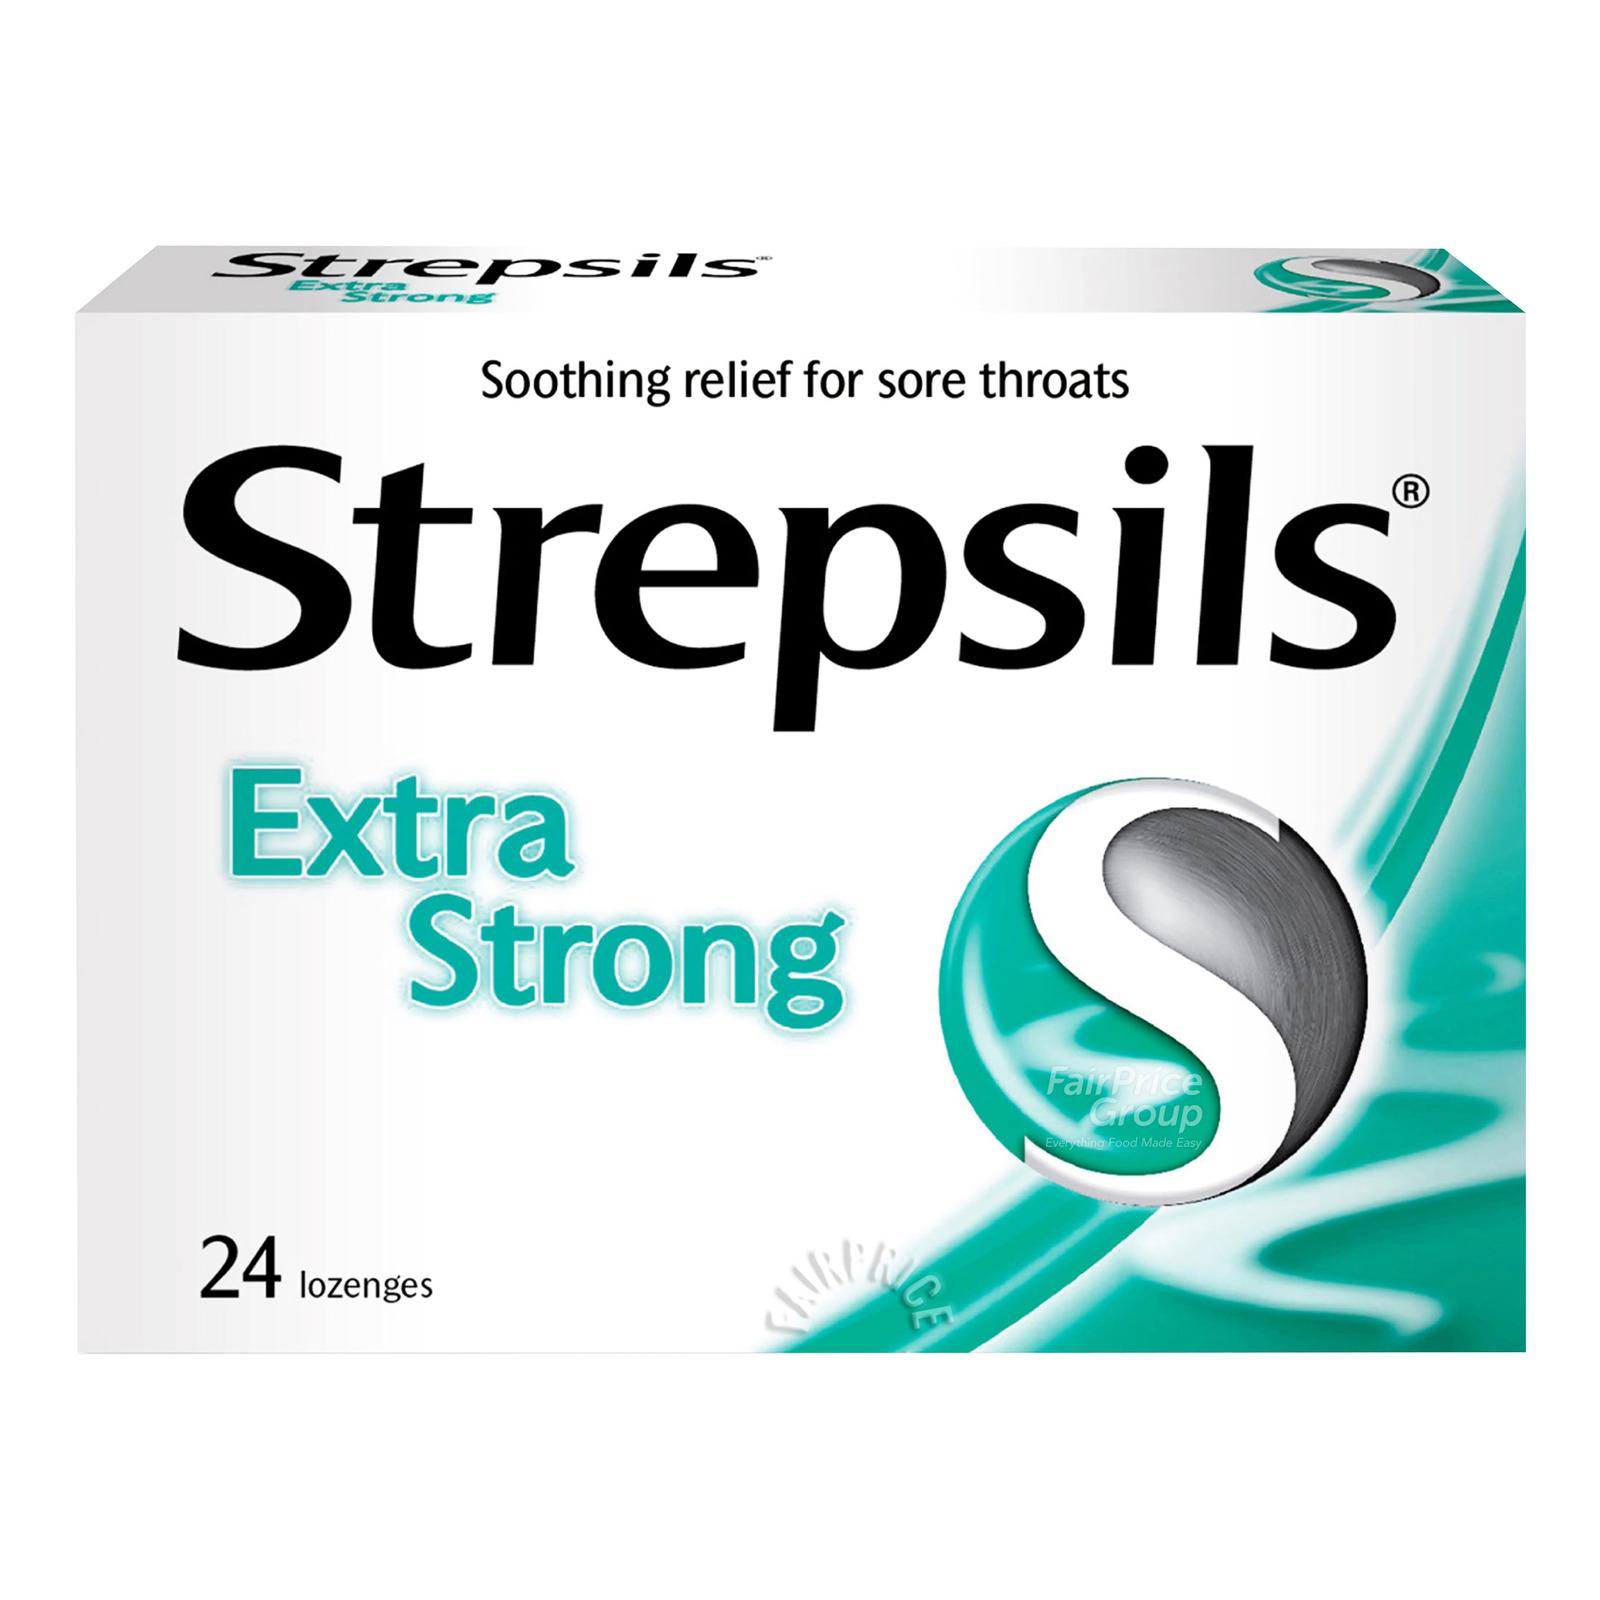 Strepsils Lozenges Box - Extra Strong